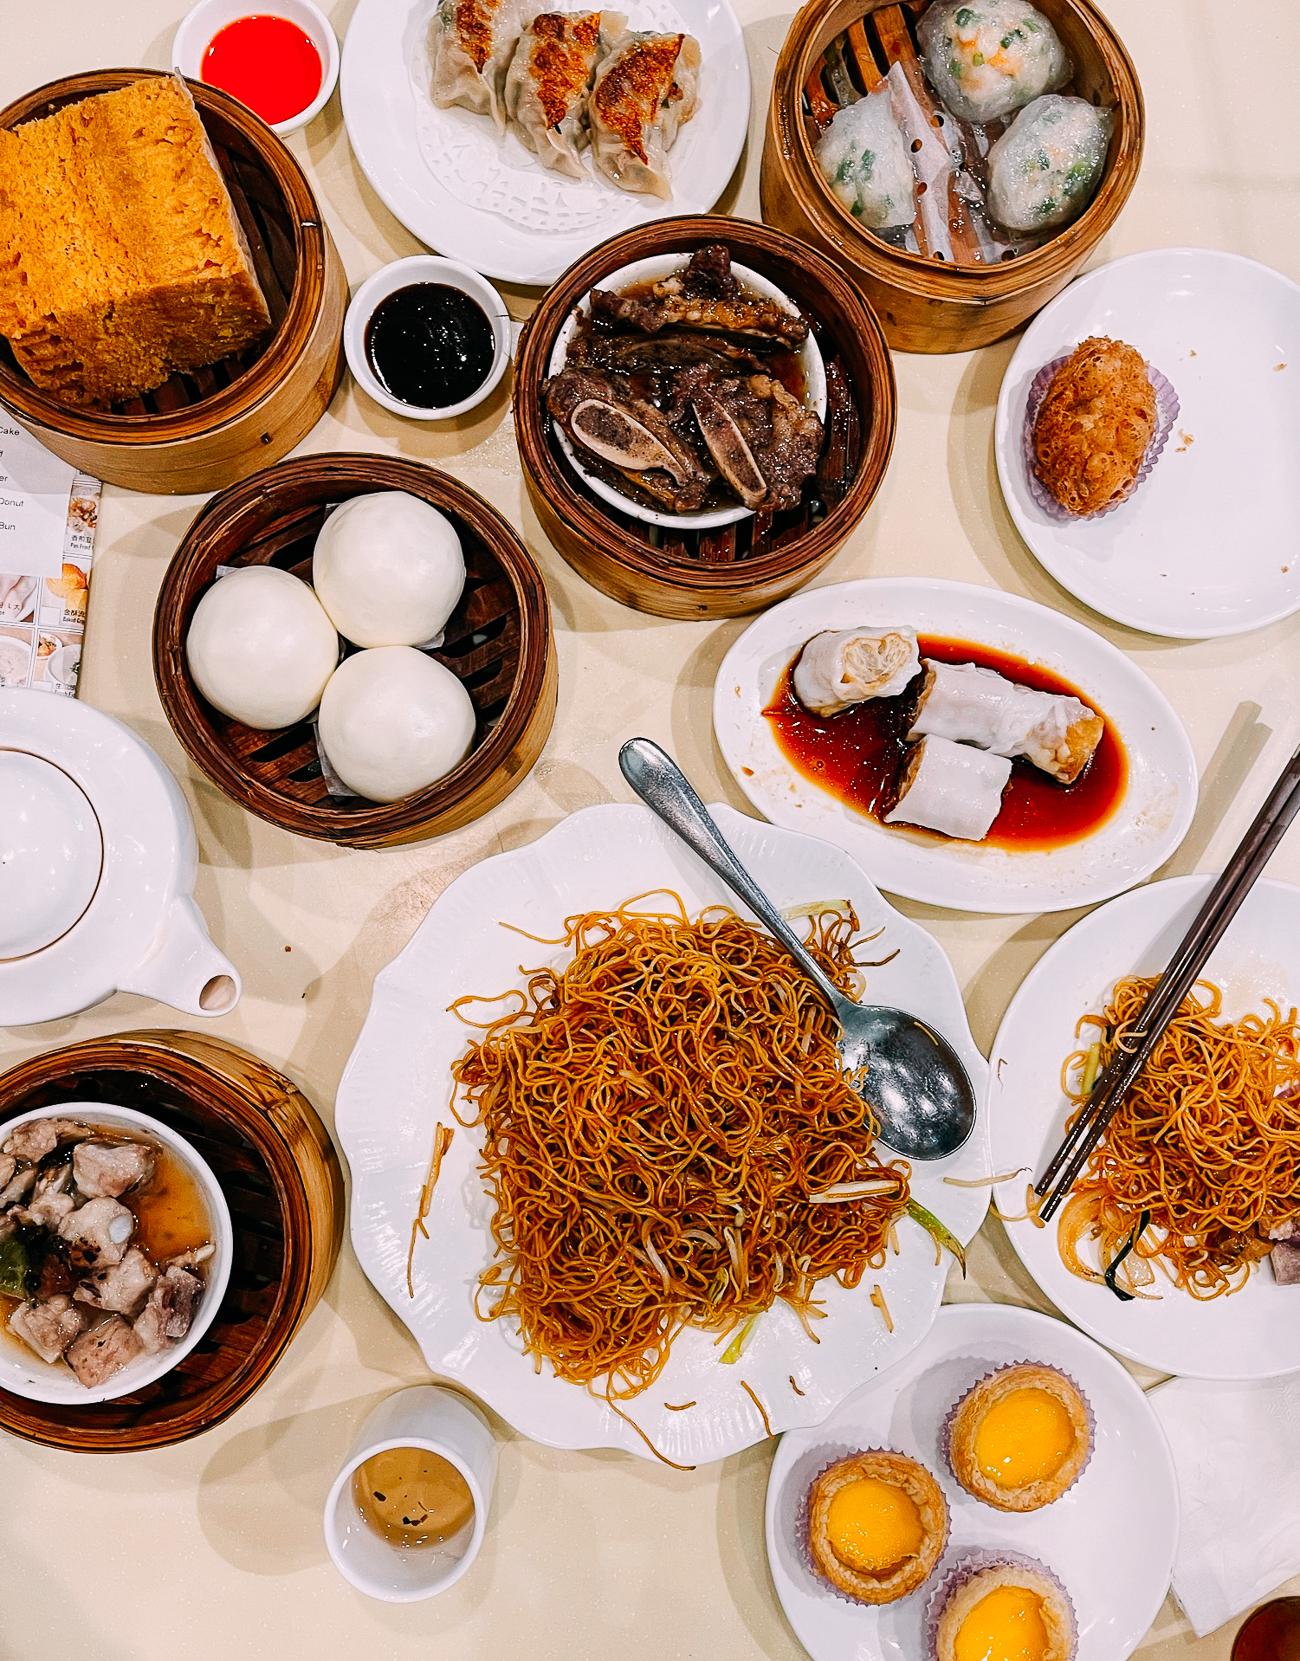 Dim Sum Spread at MingHin Cuisine in Chicago Chinatown